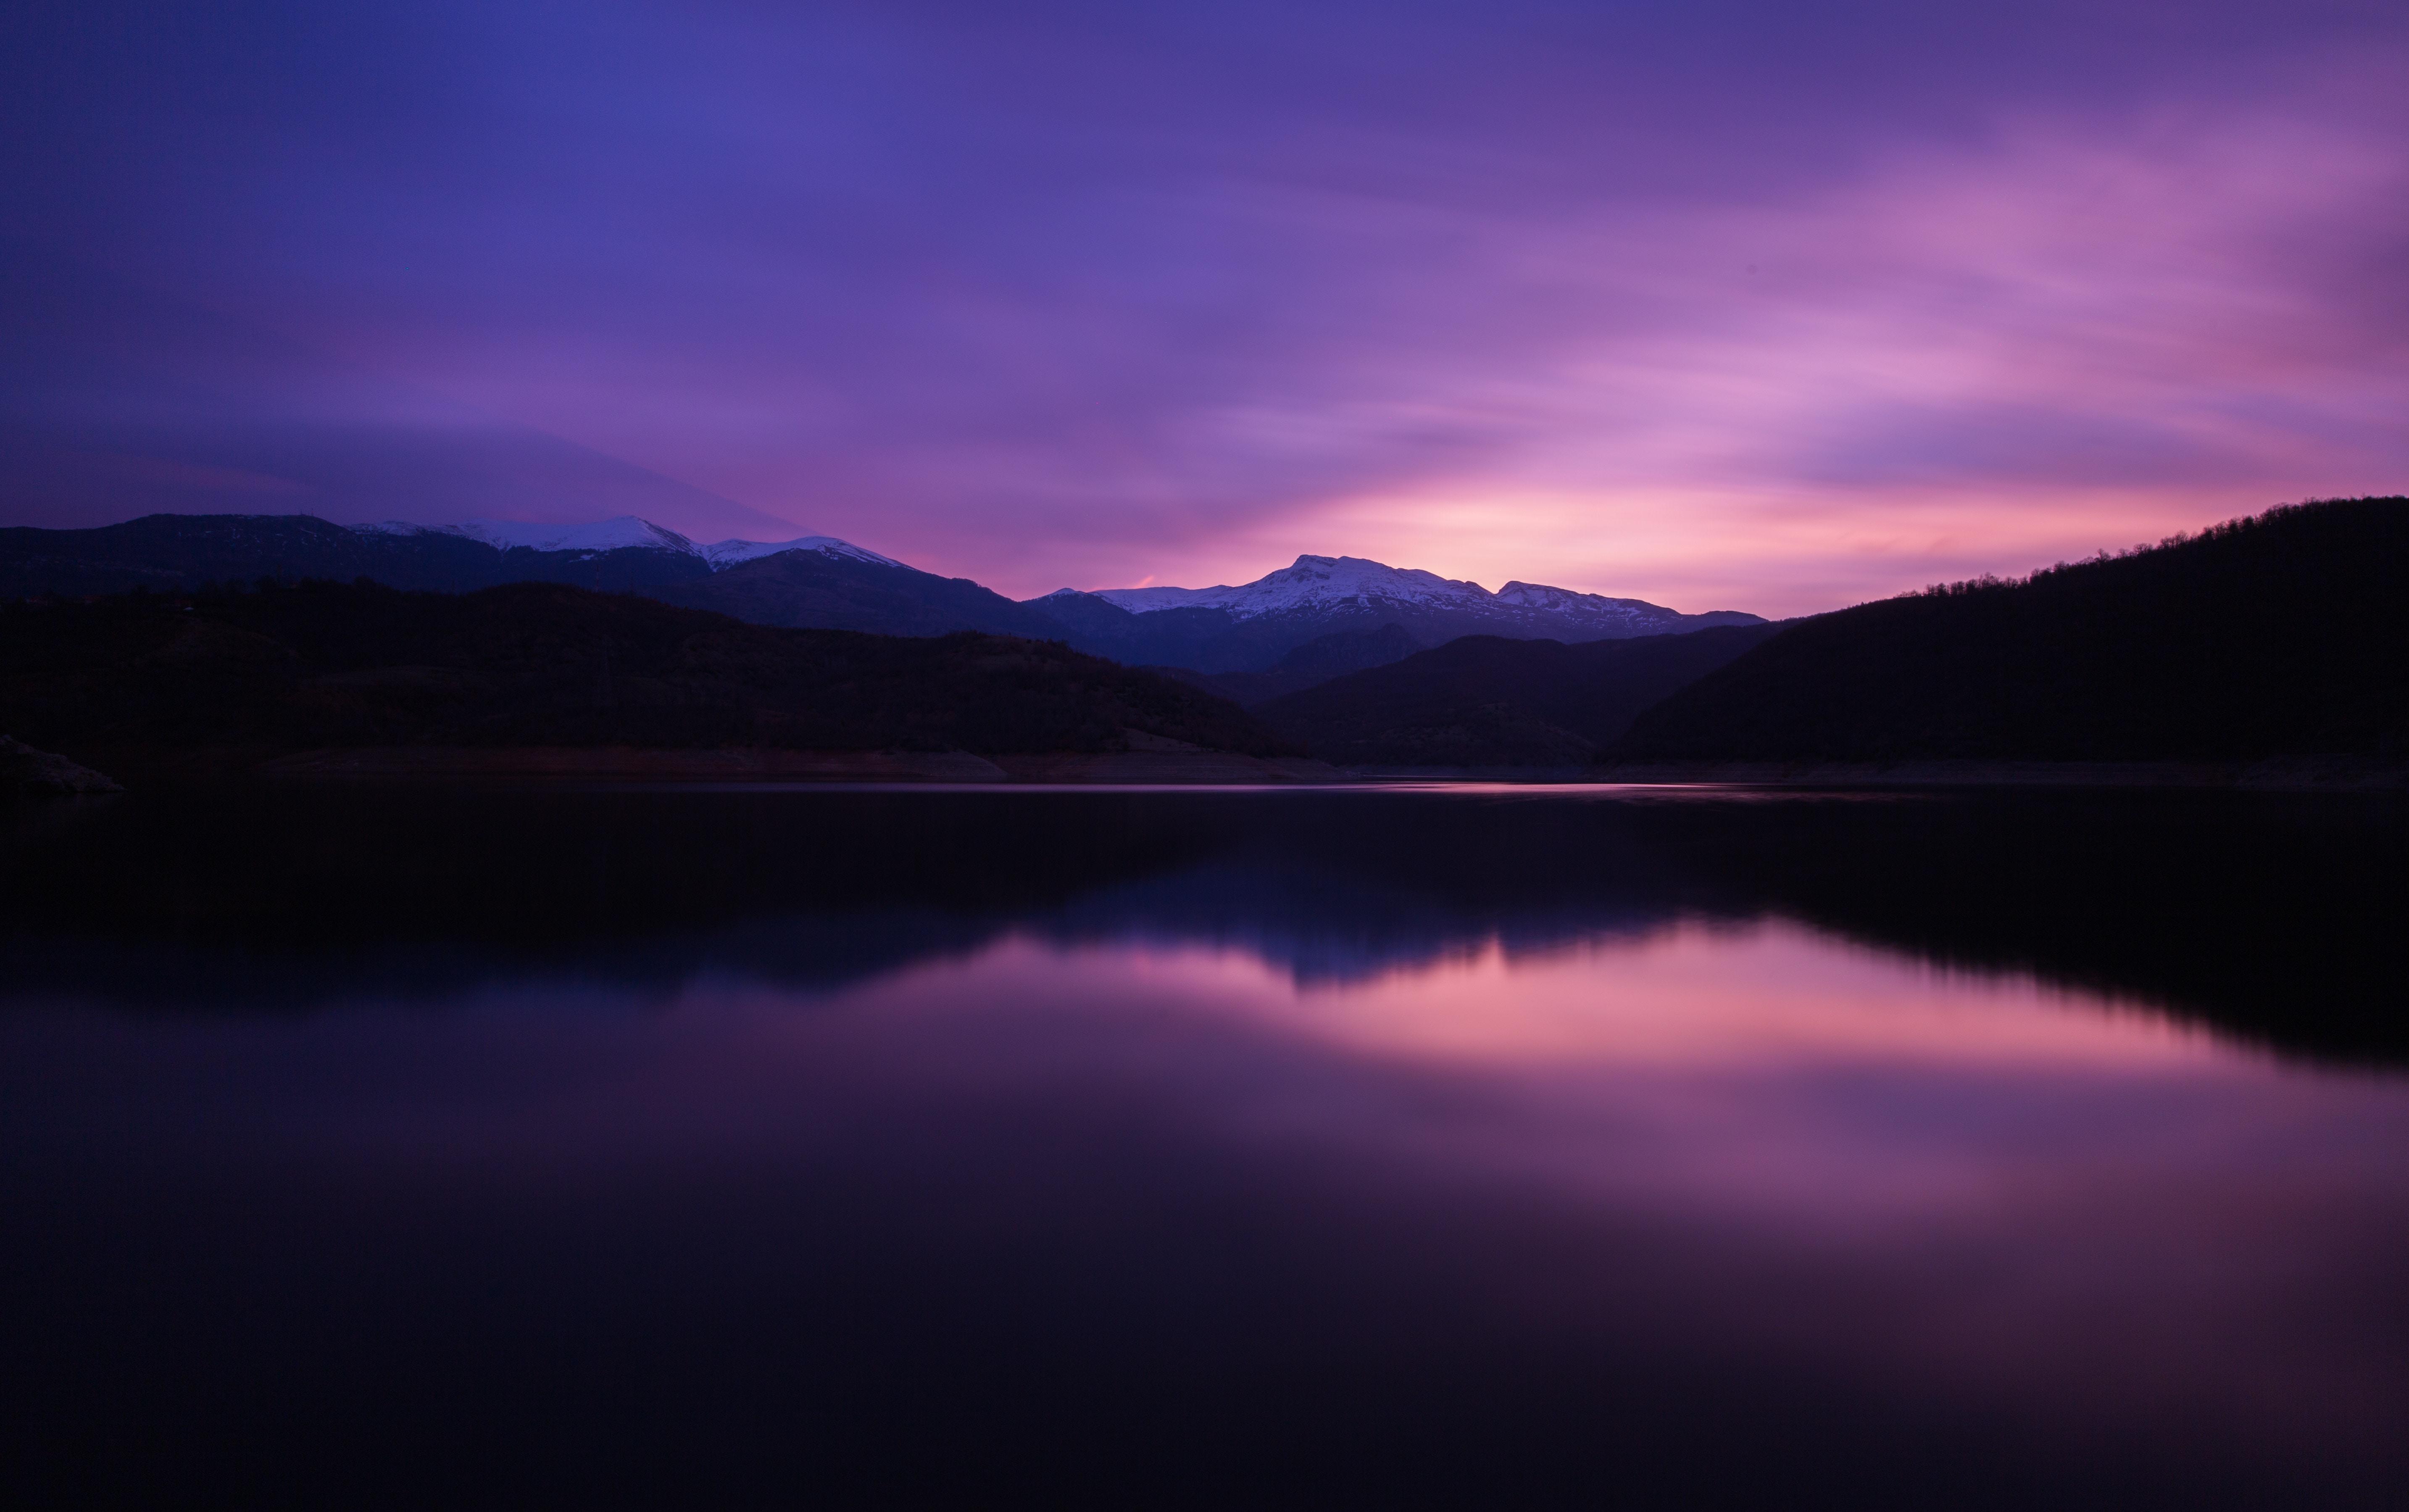 Lake Mountain Reflection Minimalism Wallpapers Hd: Mountain Lake Night Reflection Wallpaper, HD Nature 4K